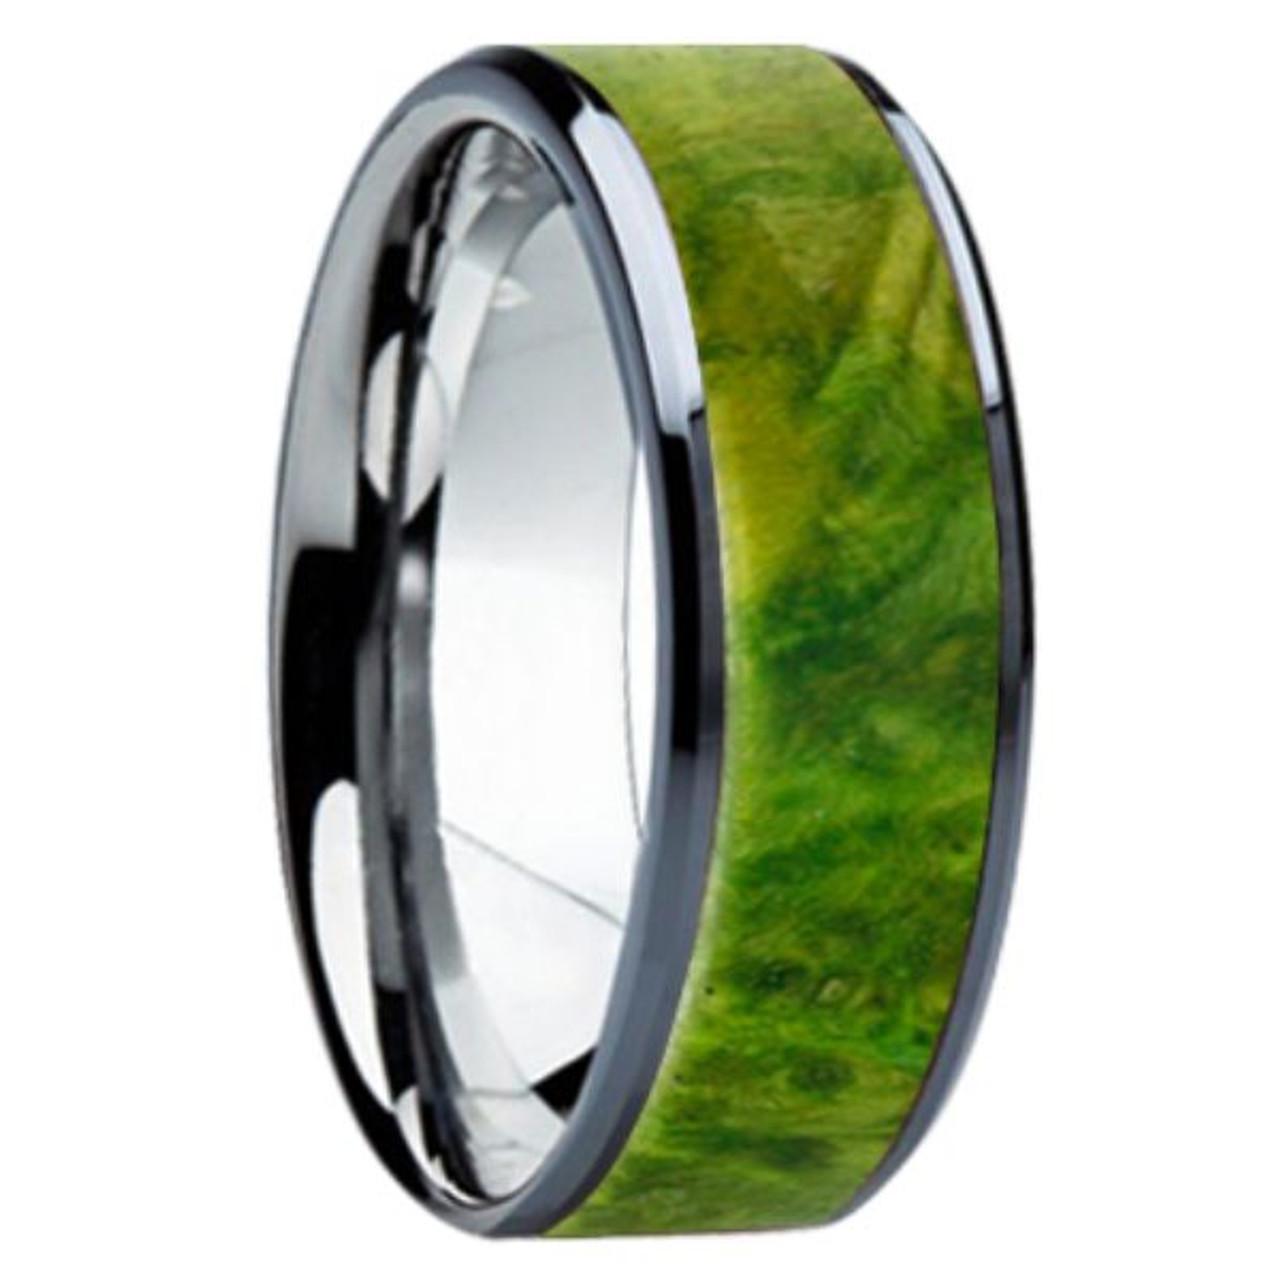 Unique Wedding Ring.8 Mm Unique Wedding Bands Green Box Elder Wood Inlay K121m Greenbe